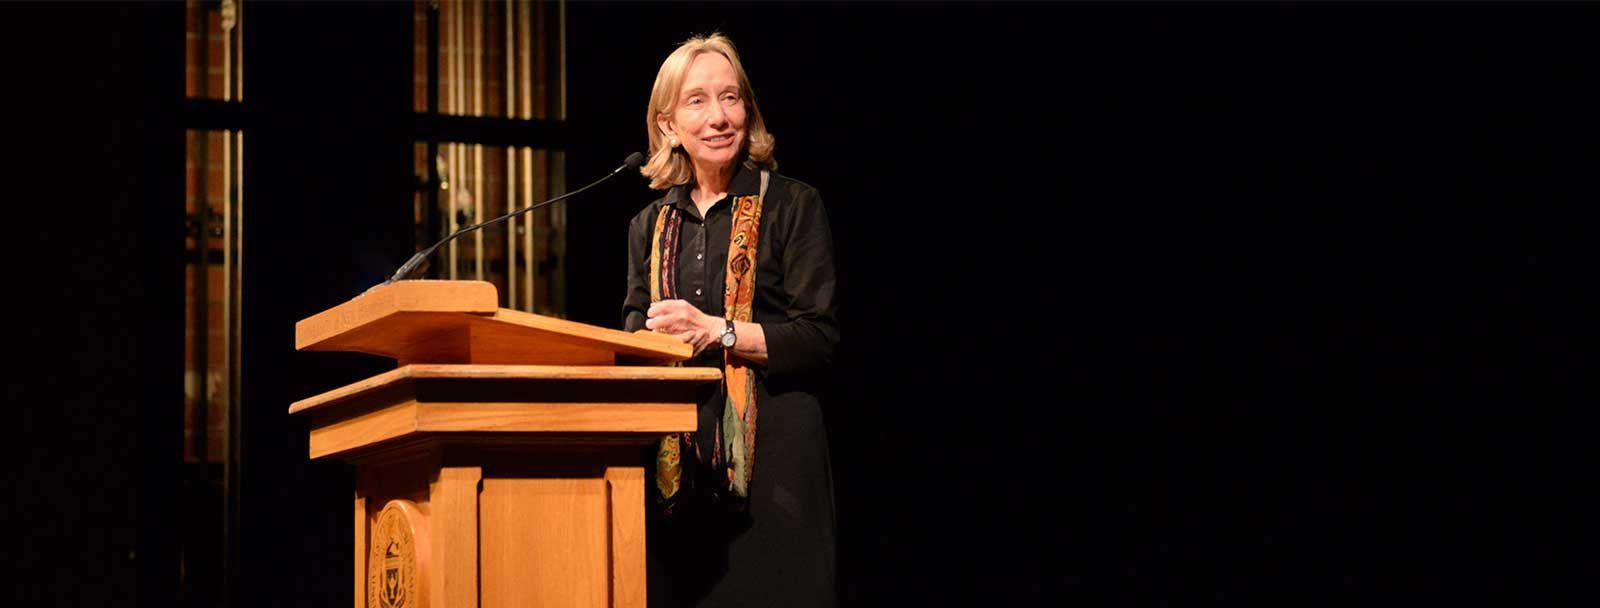 Doris Kearns Goodwin at the University of New Hampshire